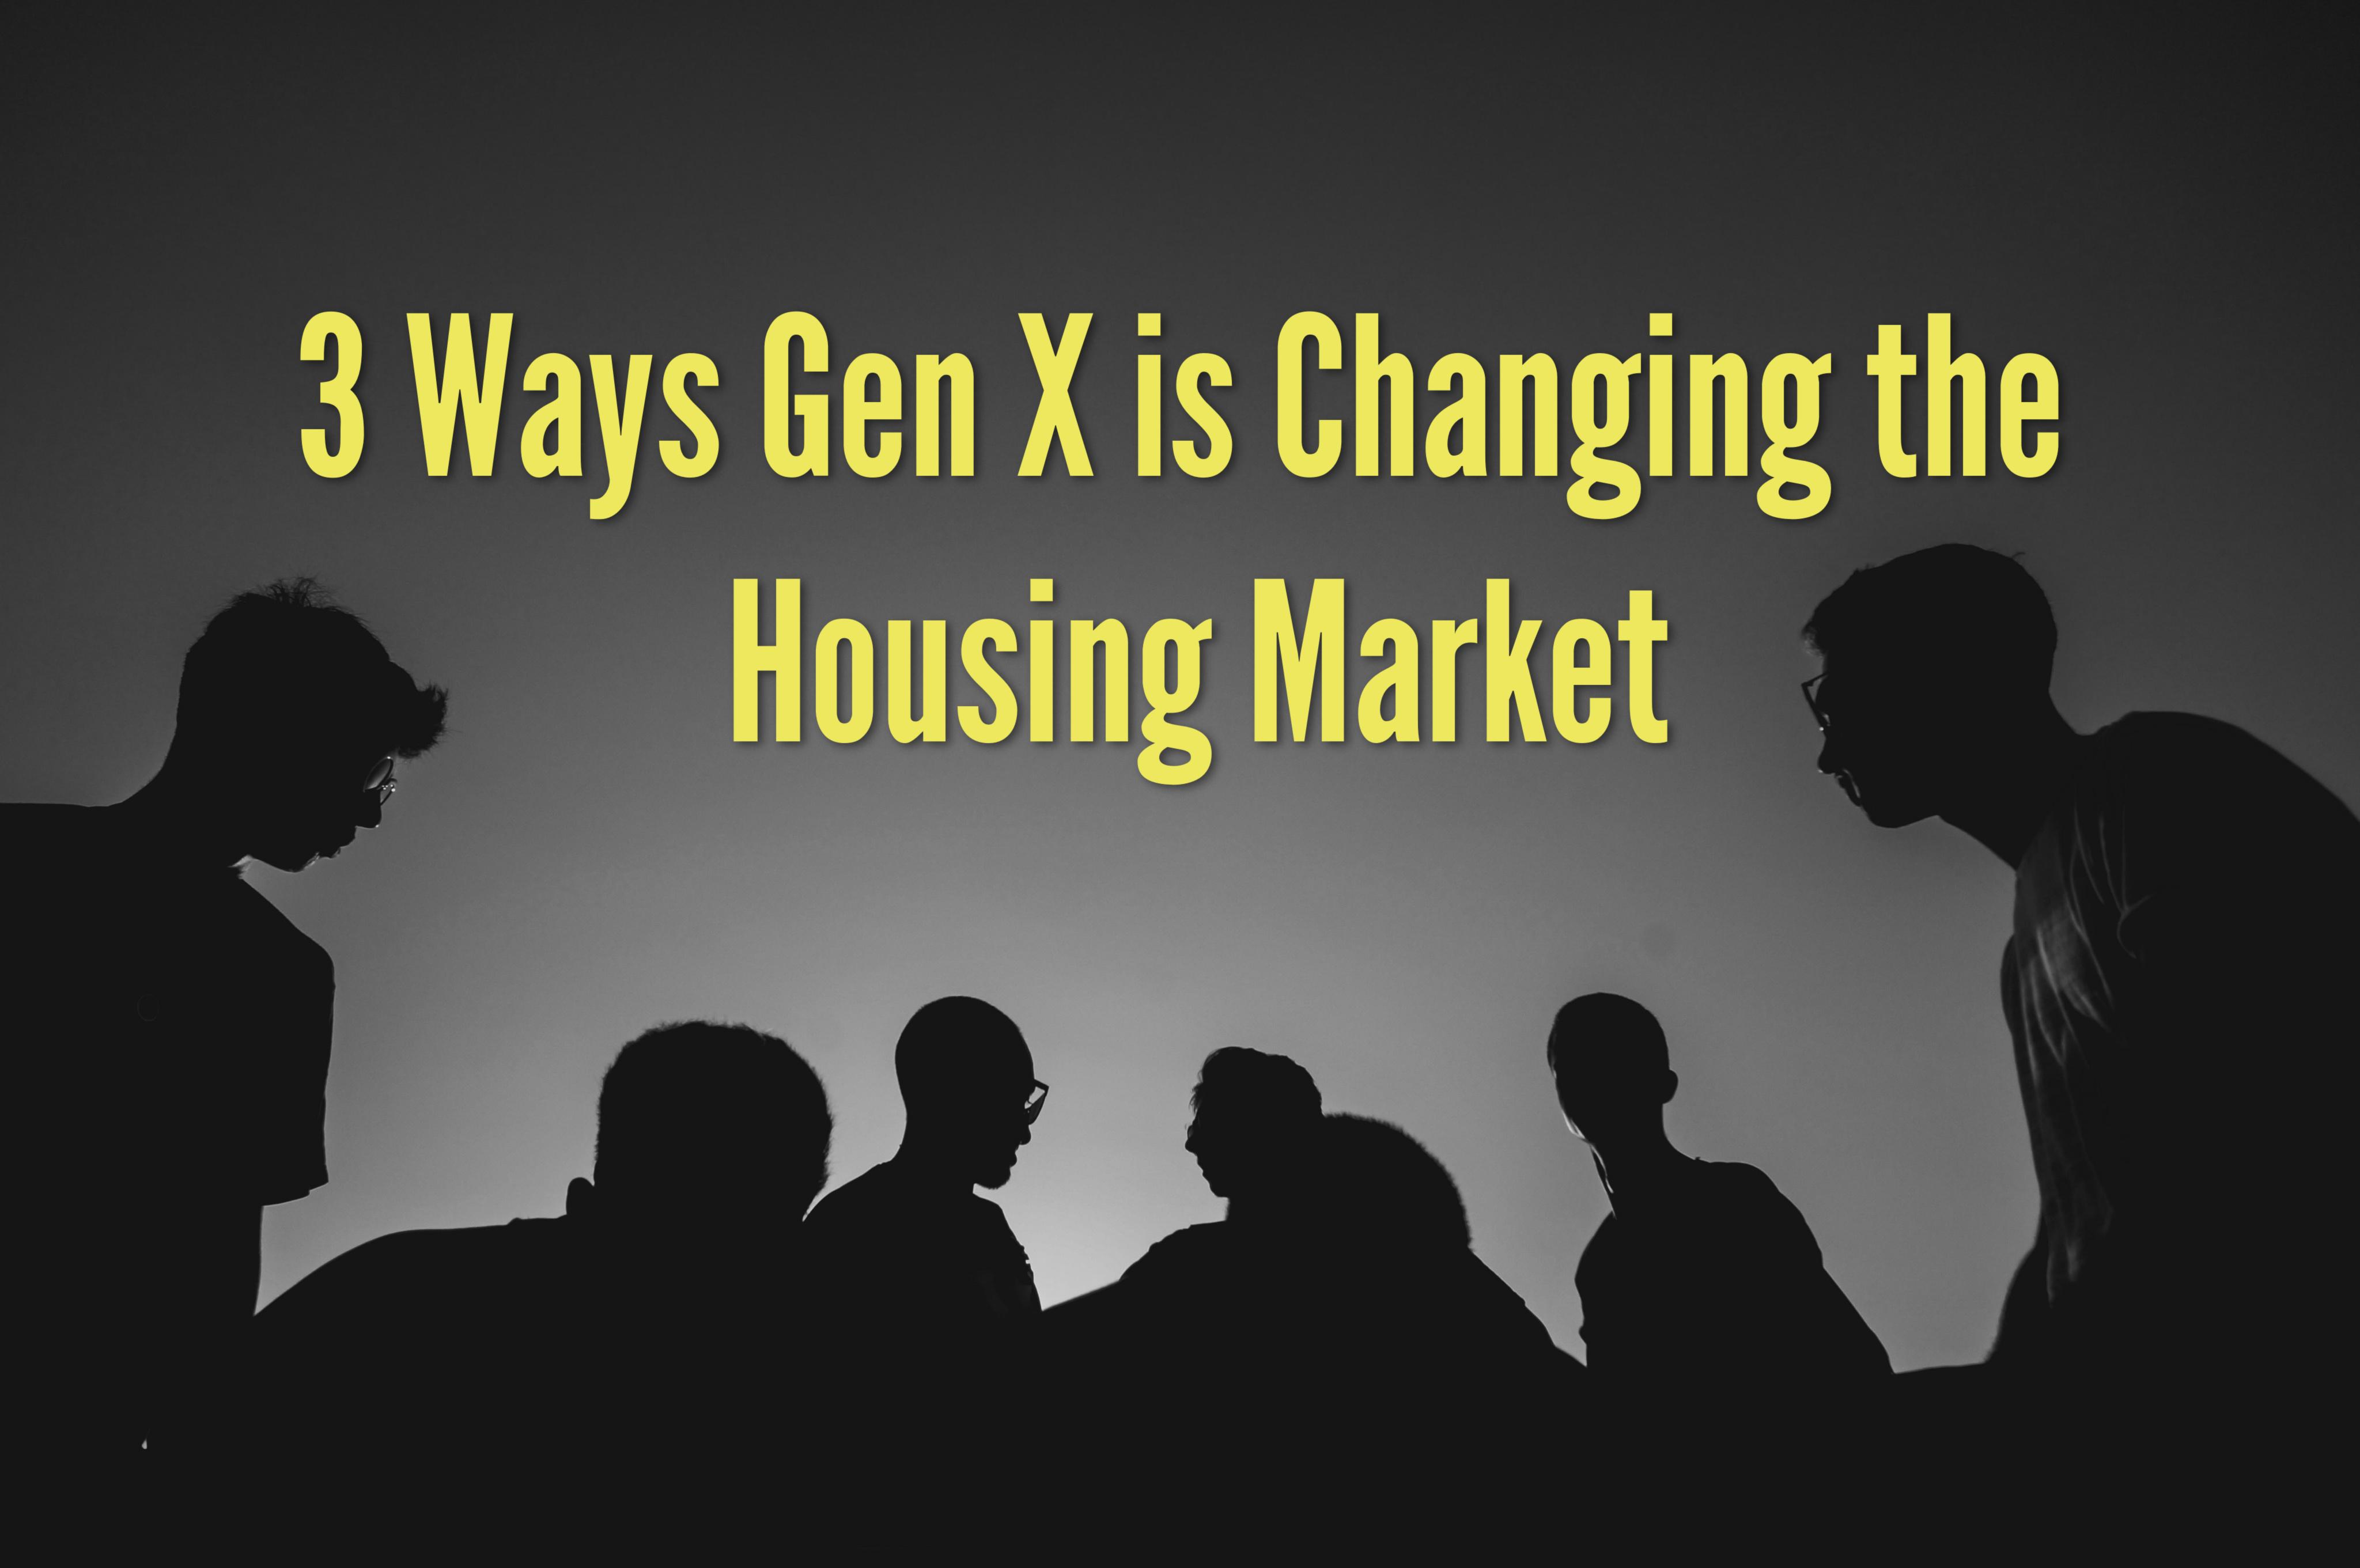 3 Ways Gen X is Changing the Housing Market